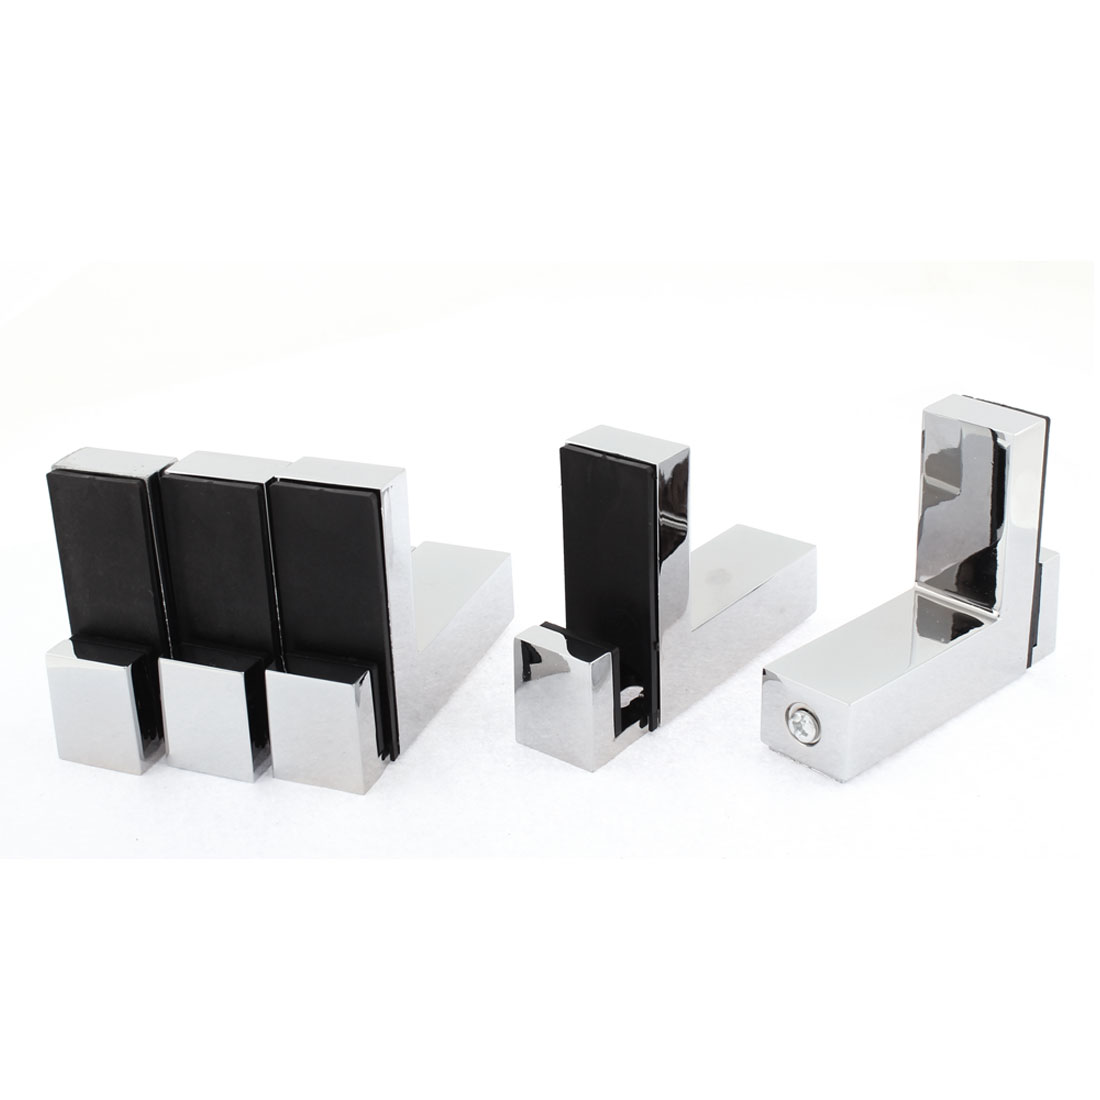 L Shaped Adjustable Glass Shelf Clip Clamp Support Bracket 5pcs